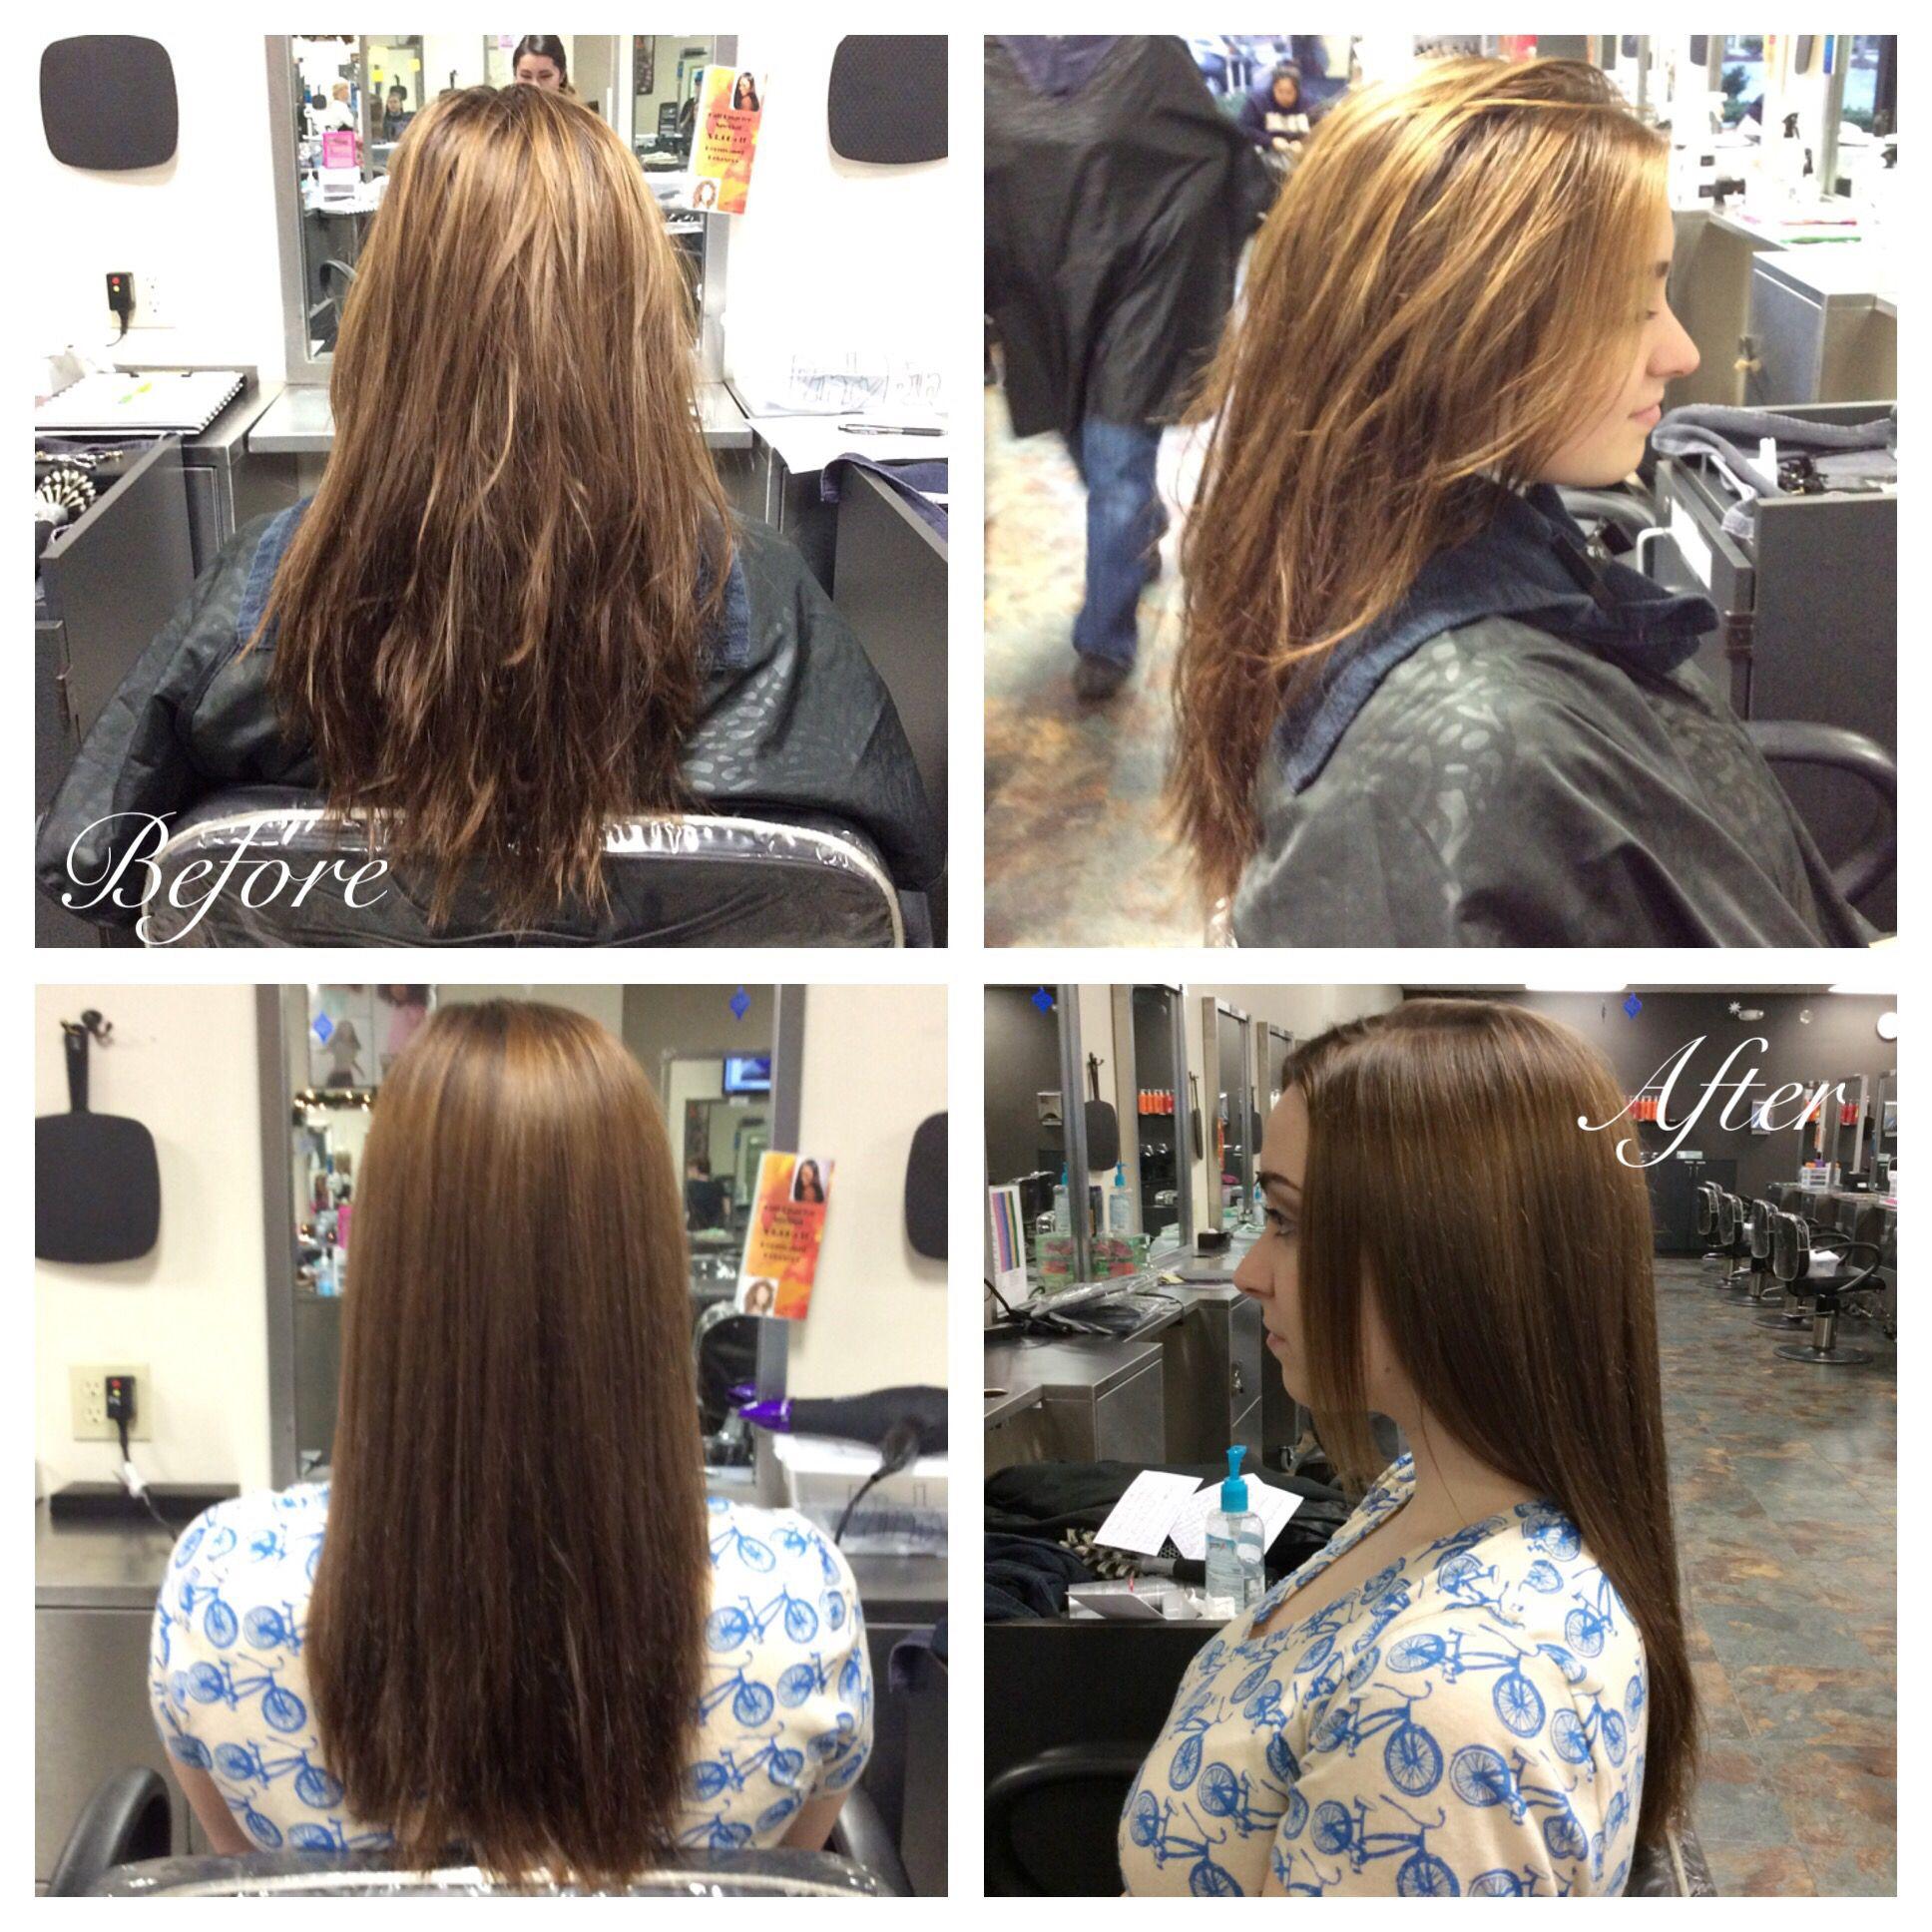 180 degree long layered haircut using shears and texturizing shears 180 degree long layered haircut using shears and texturizing shears products used pearl styler winobraniefo Gallery